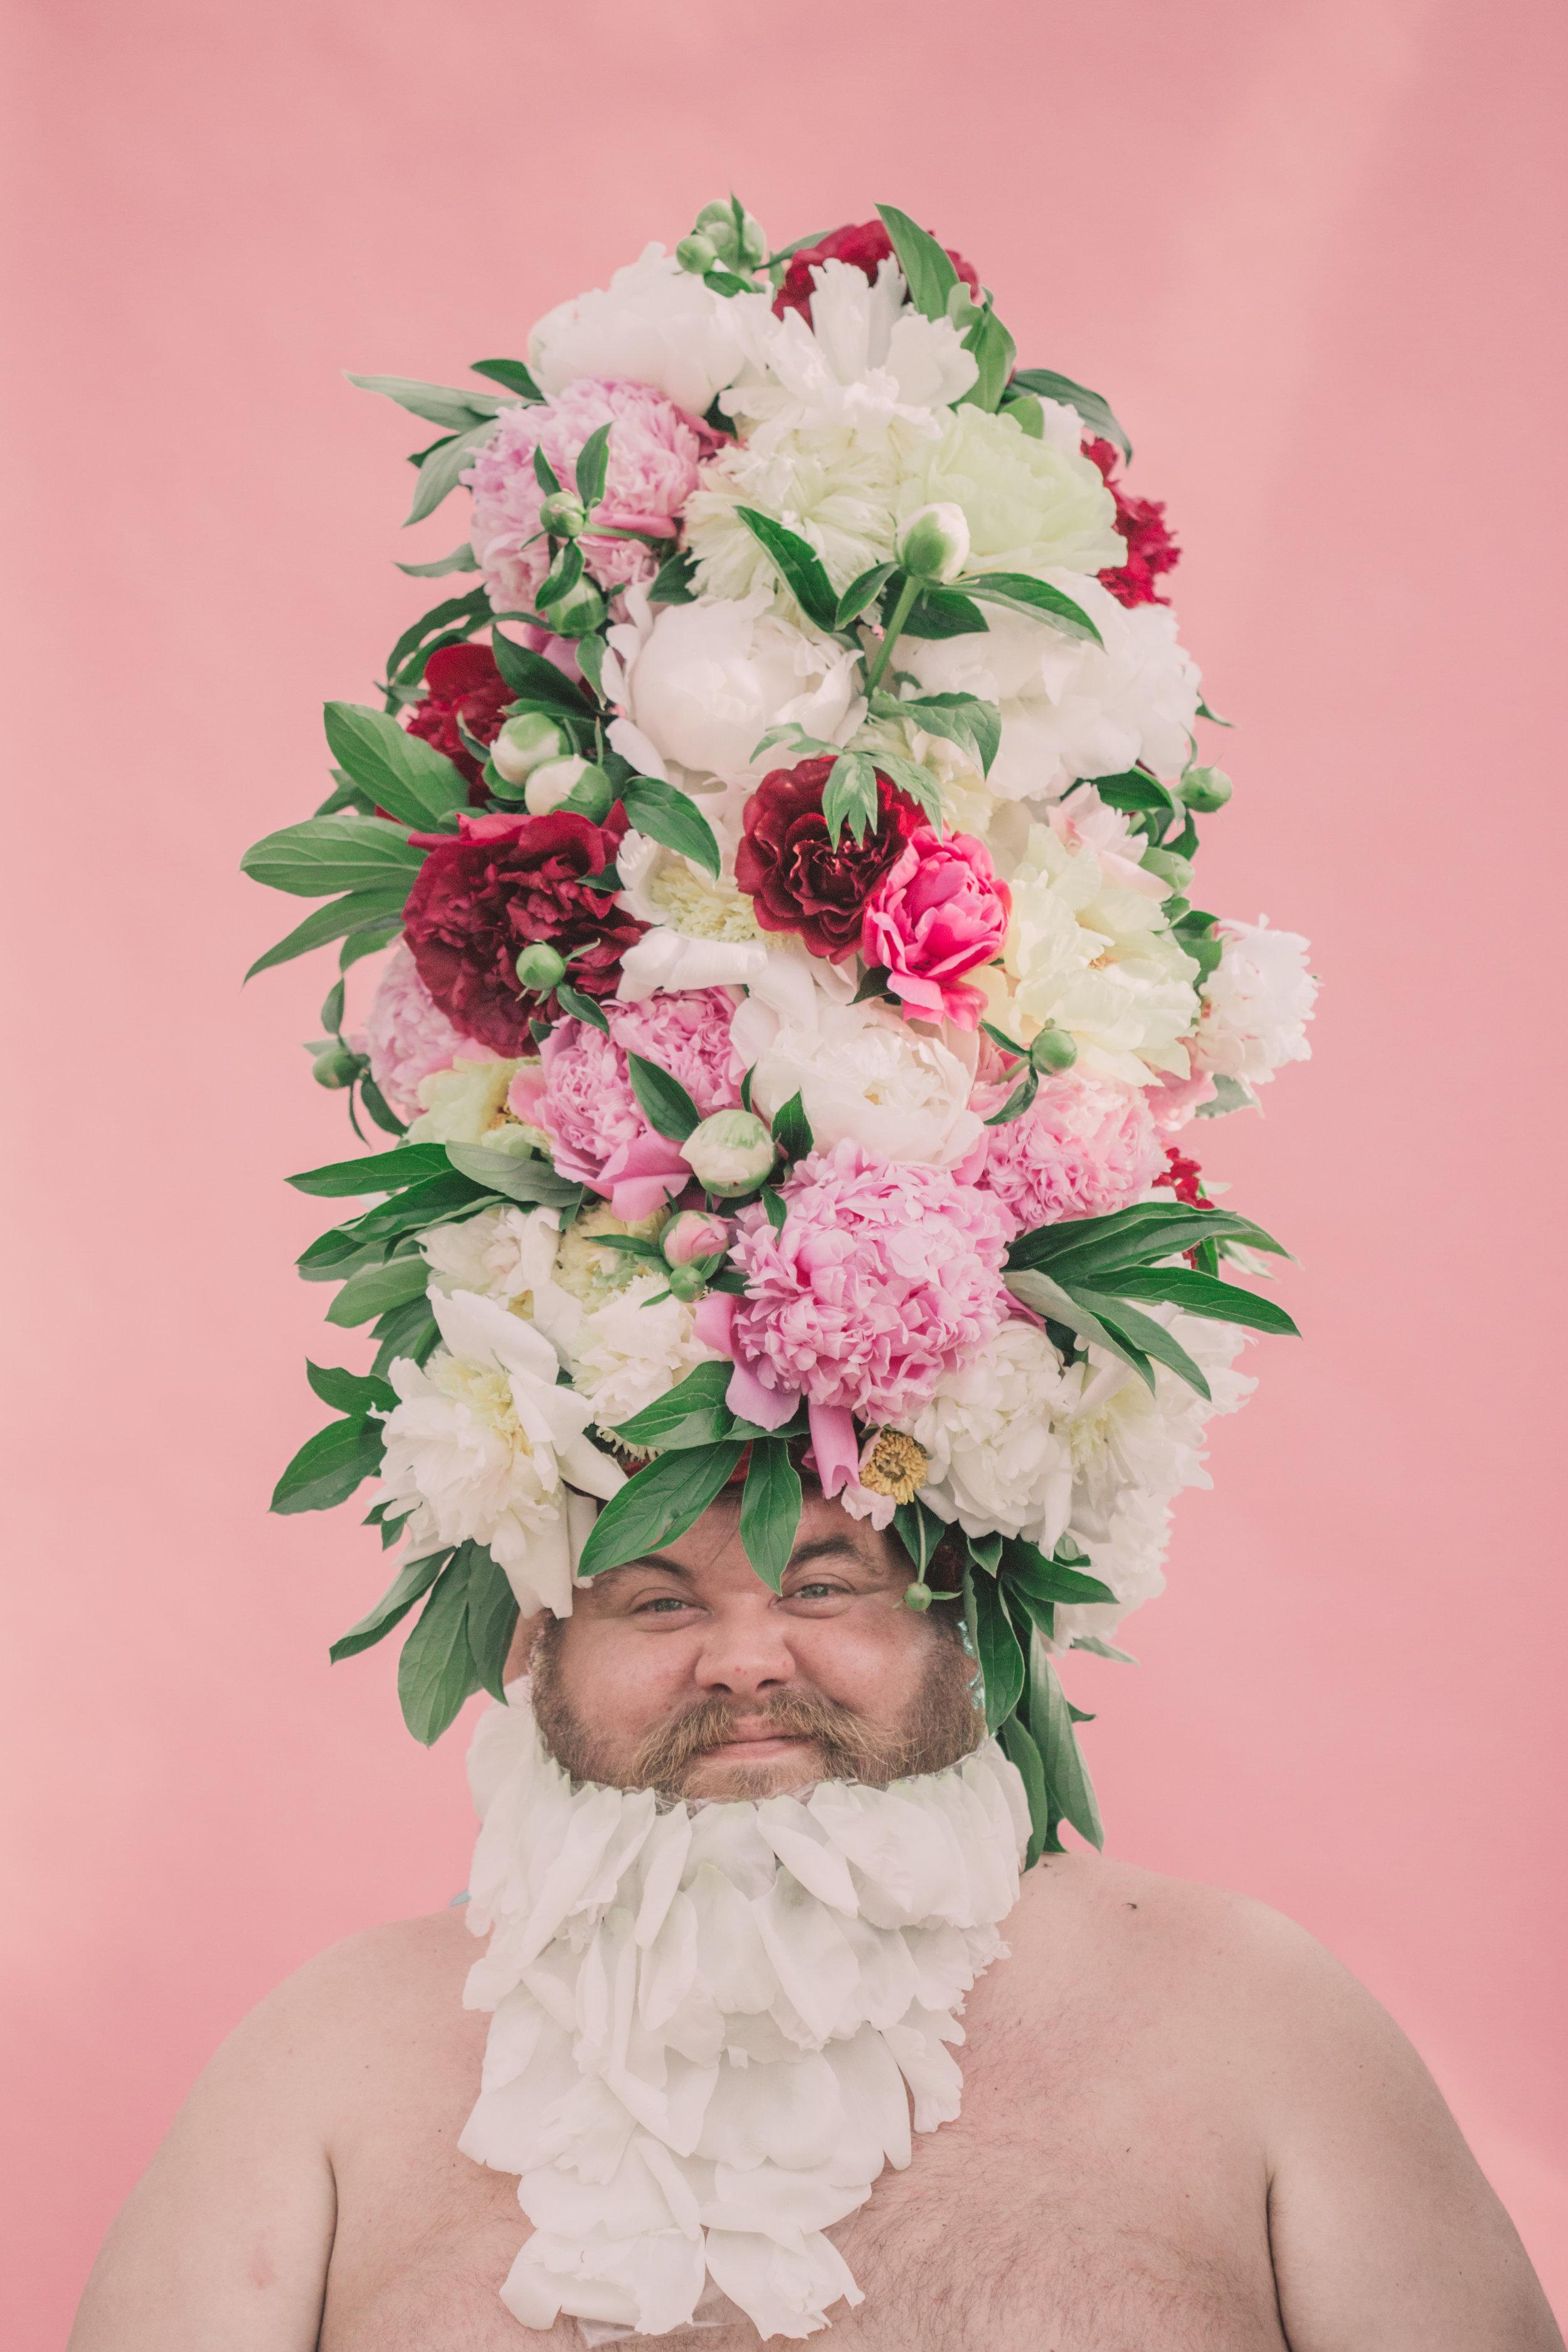 Floras-muse-beehivecollective-florist-head-piece-peonies-maineweddings.jpg